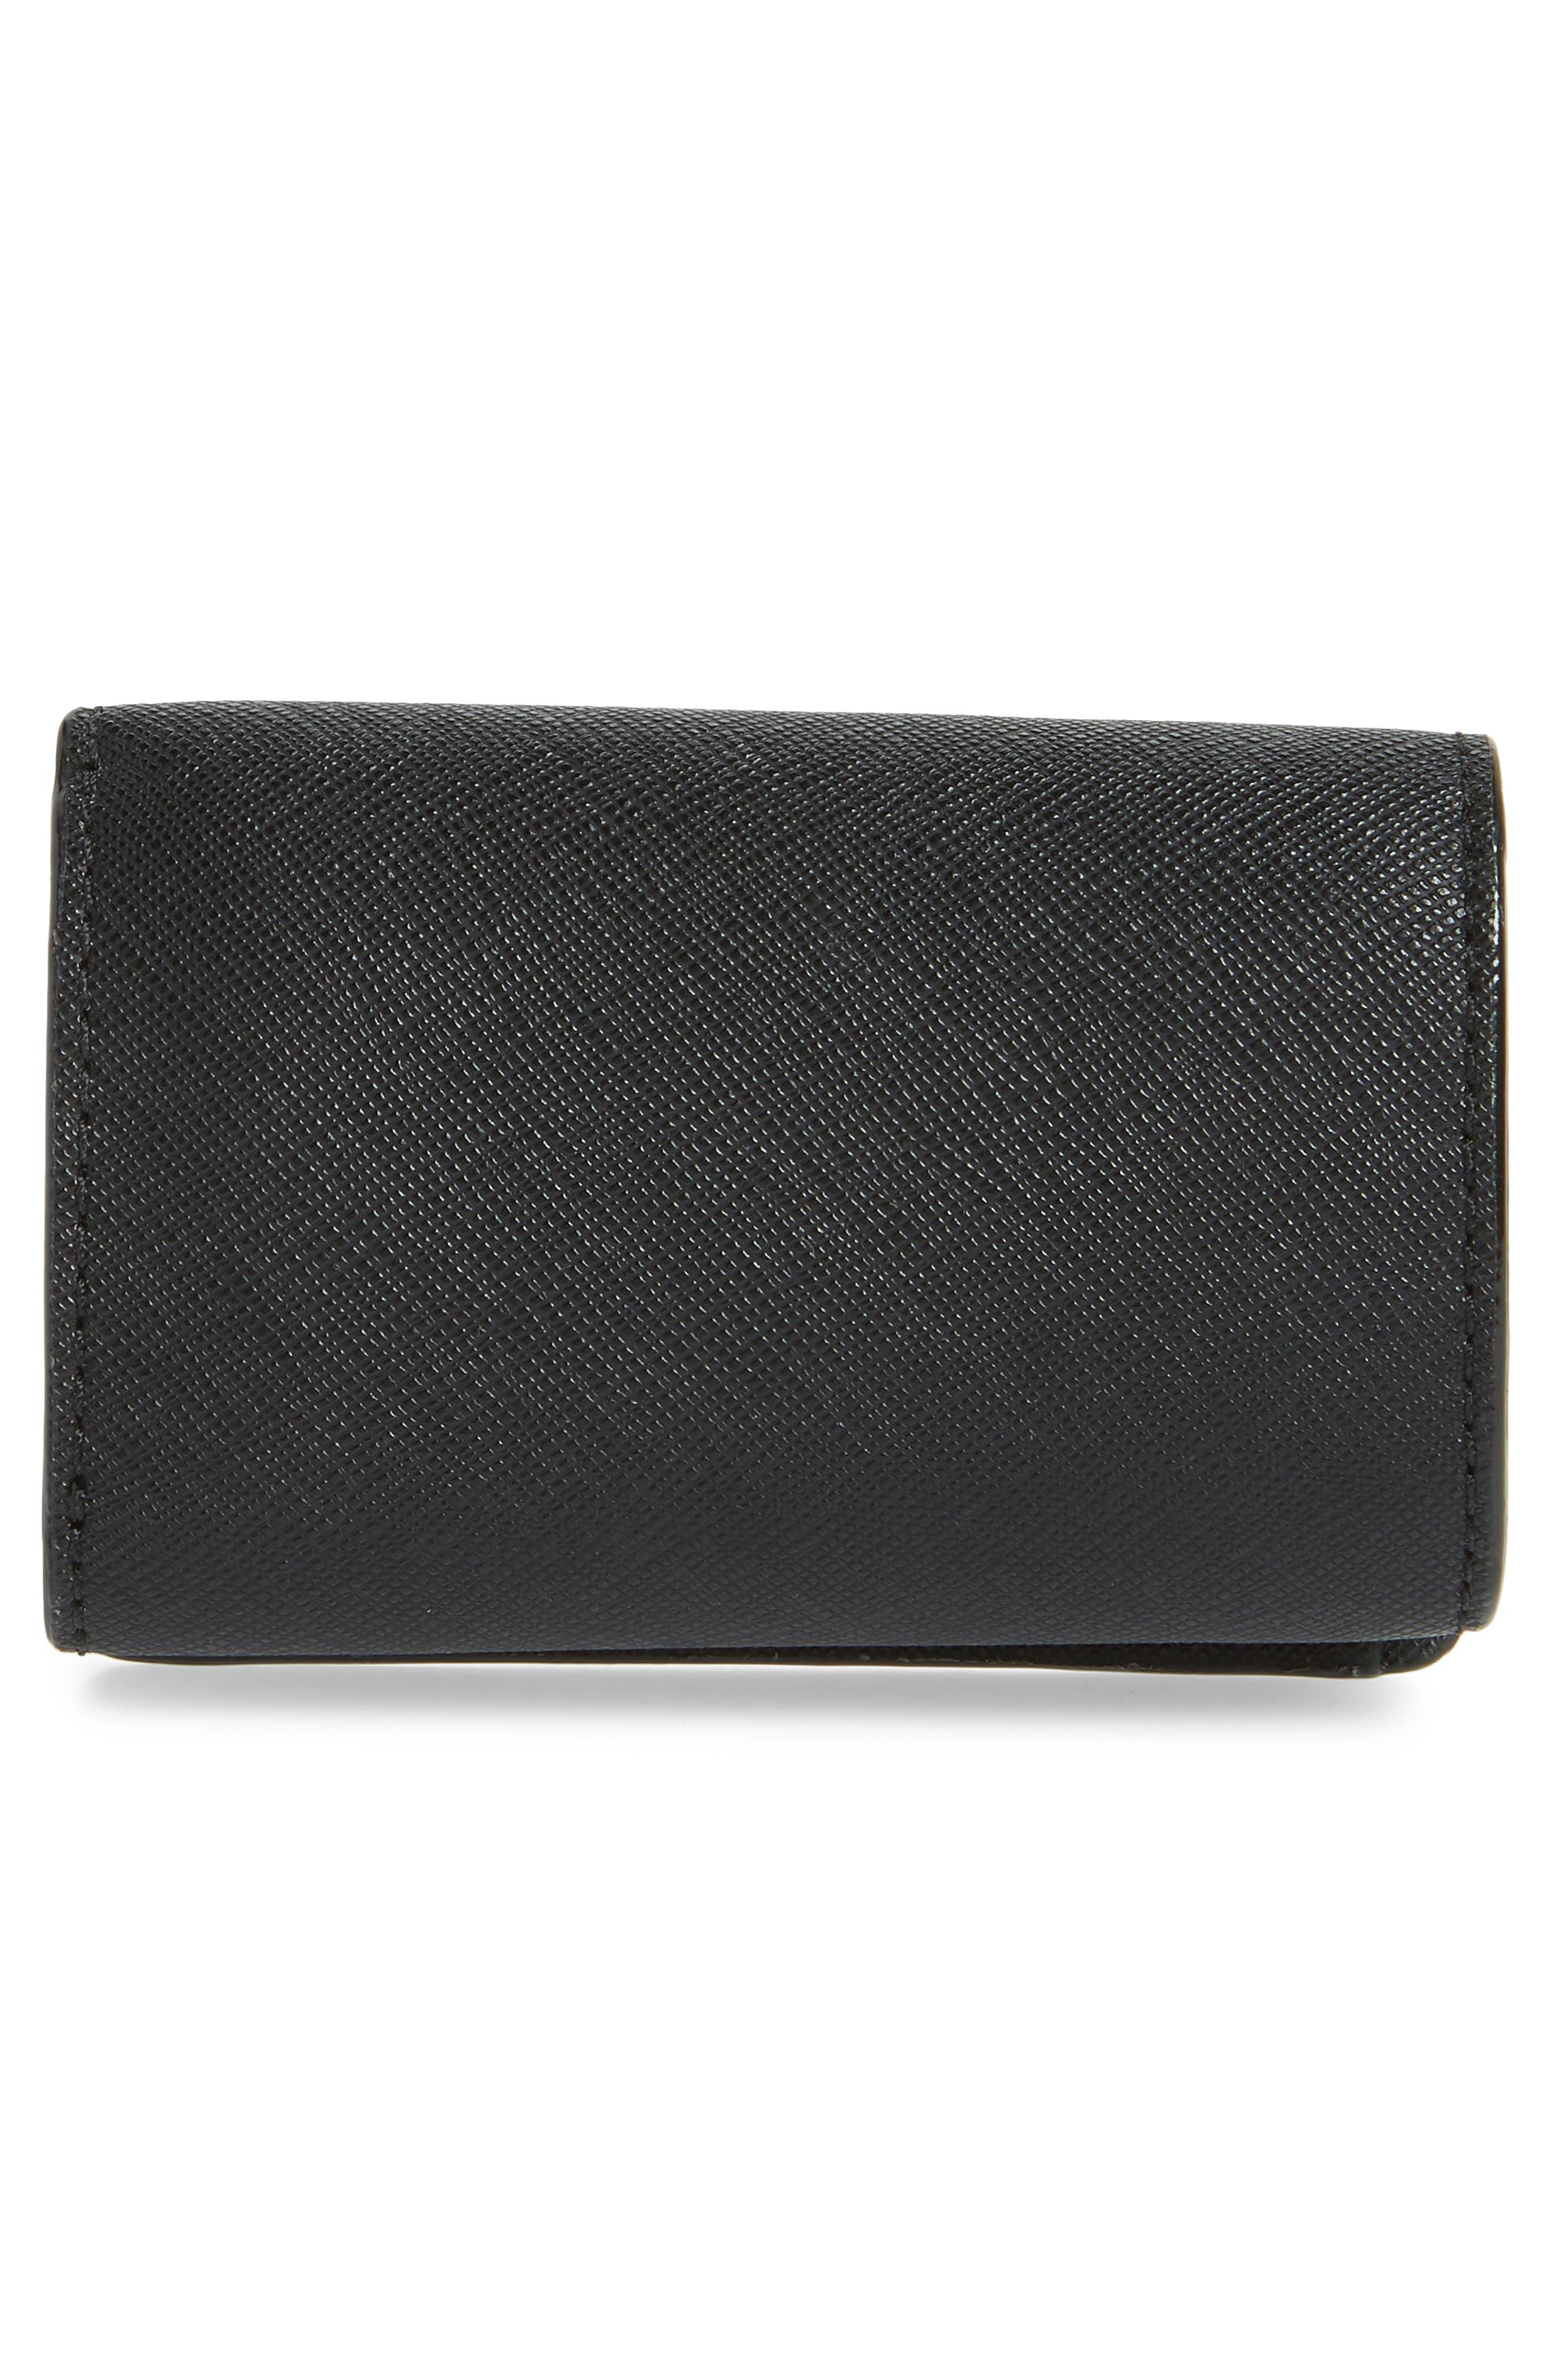 cameron street kay wallet,                             Alternate thumbnail 4, color,                             BLACK